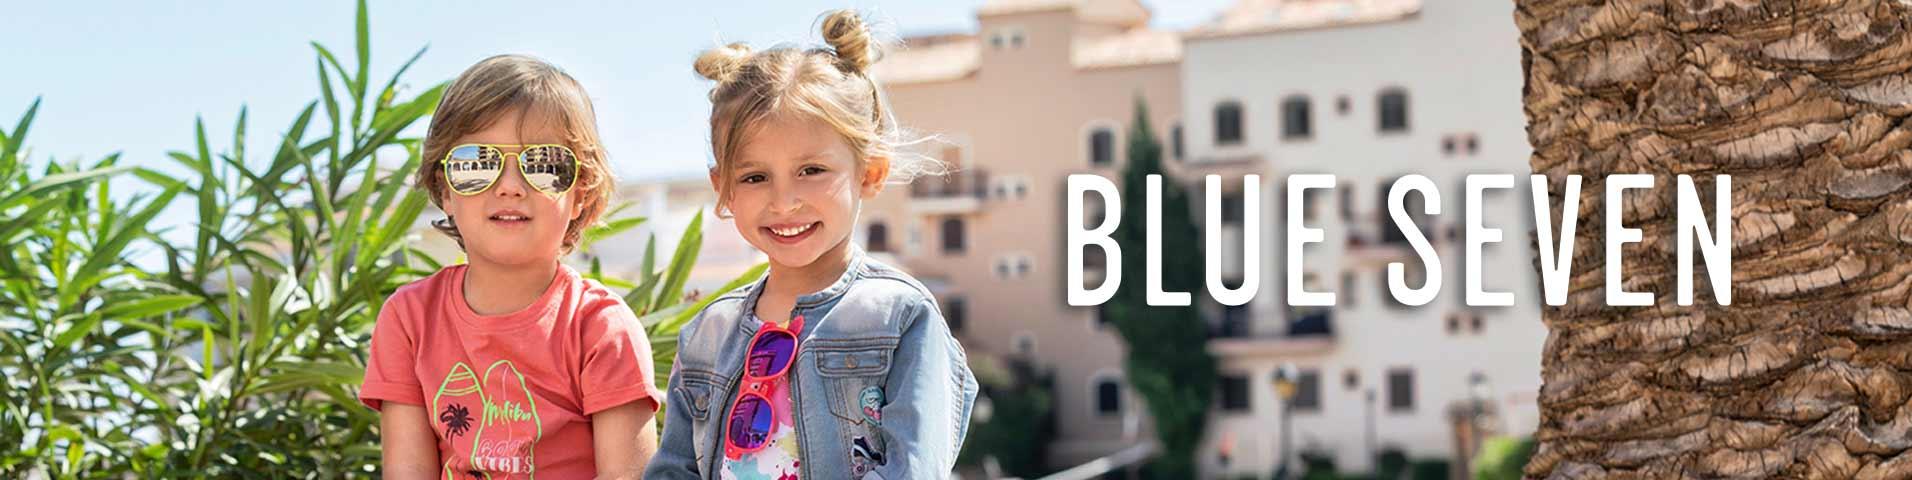 Kinderkleding Zalando.Blue Seven Outlet Kinderkleding Zalando Ontdek Het Hier